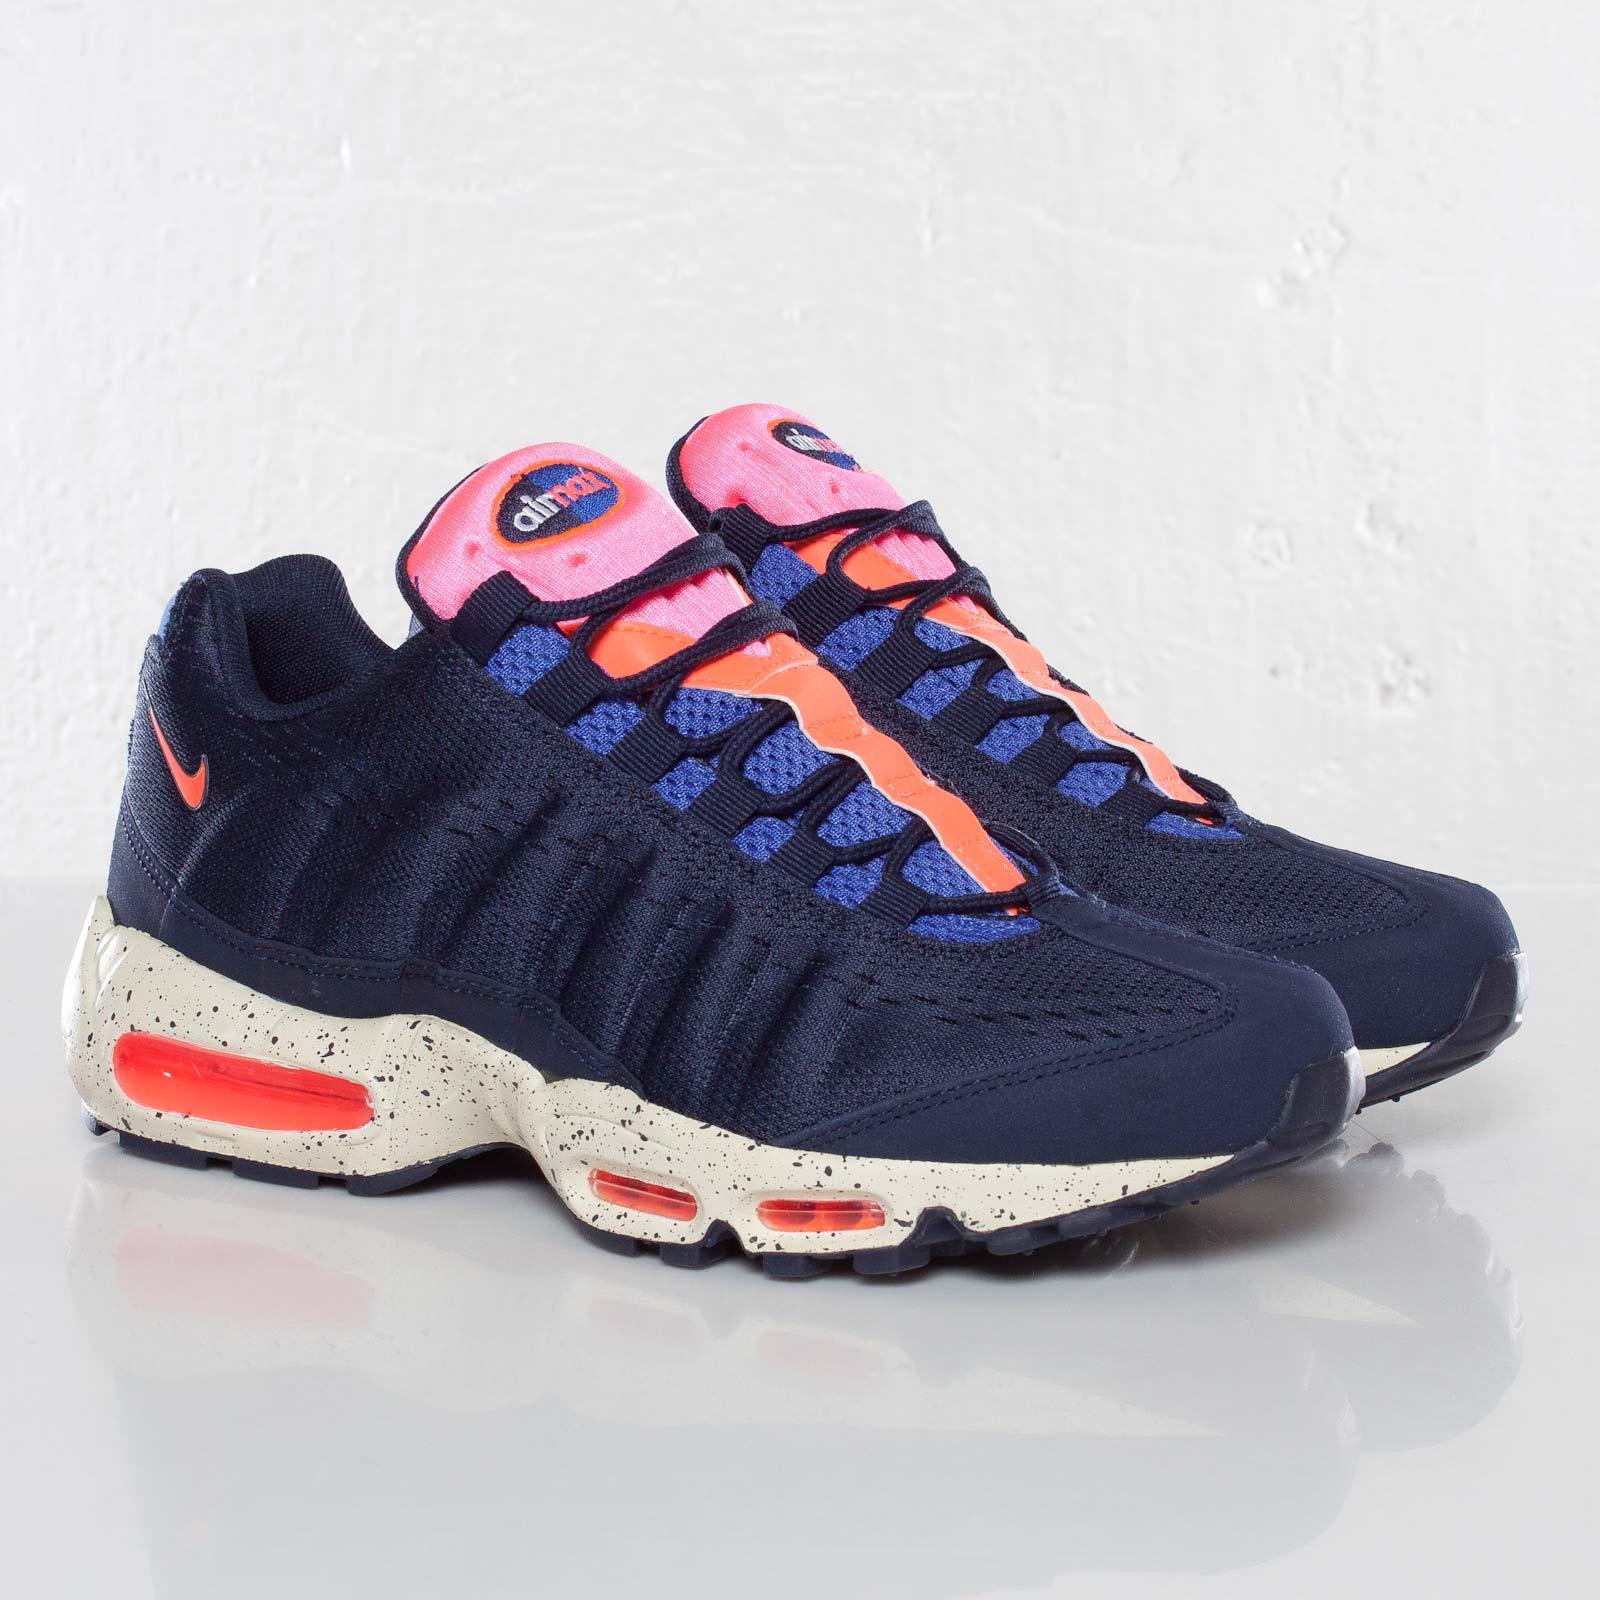 c7bc0f28e746 Nike Air Max 95 EM - 554971-164 - Sneakersnstuff